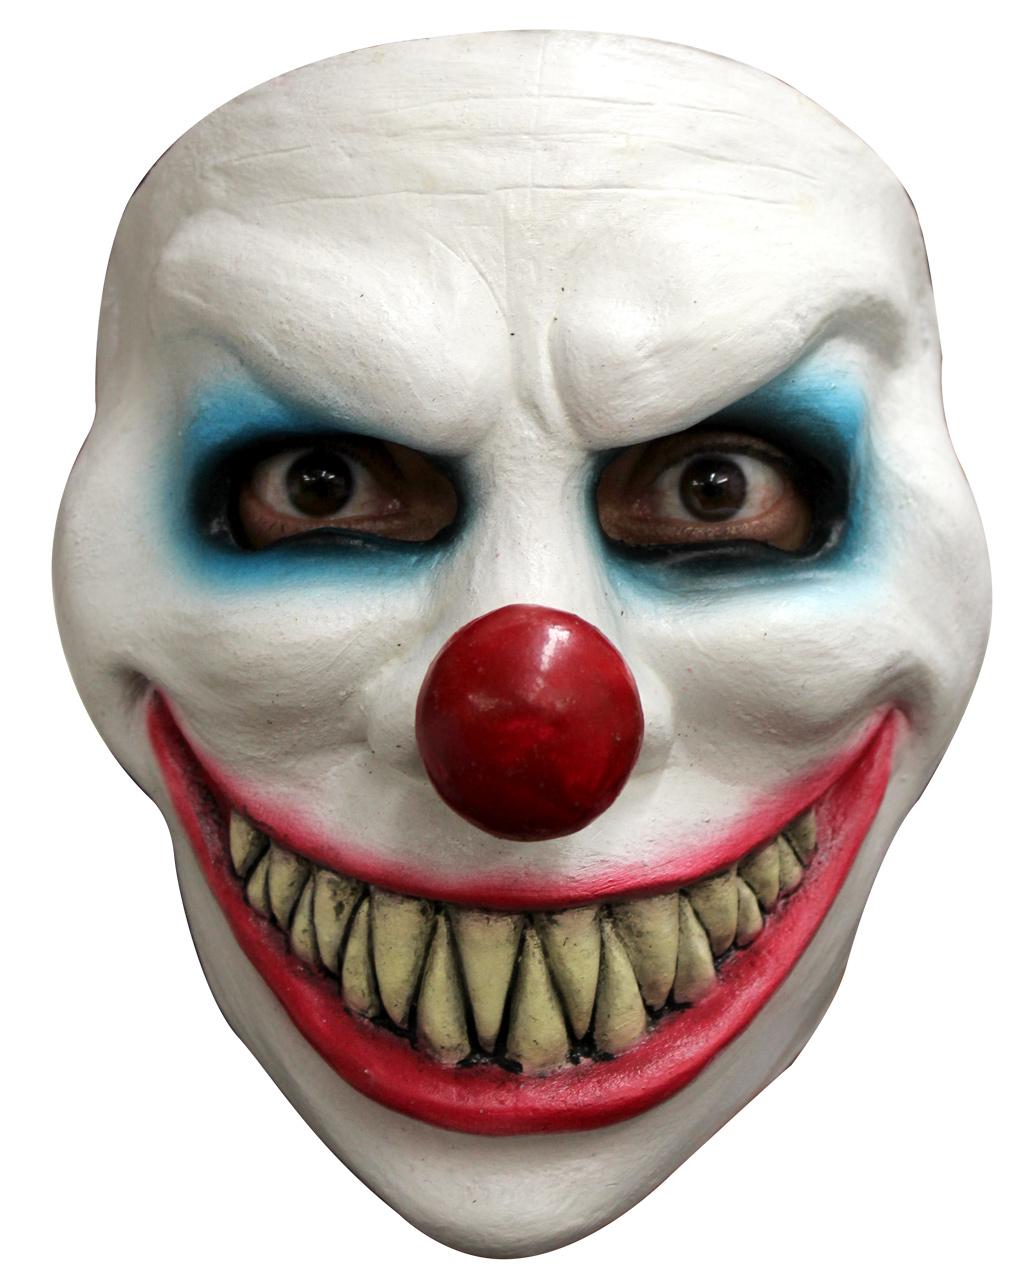 Evil Laugh Clown Mask Horror Clown Mask | horror-shop.com Scary Halloween Clown Masks